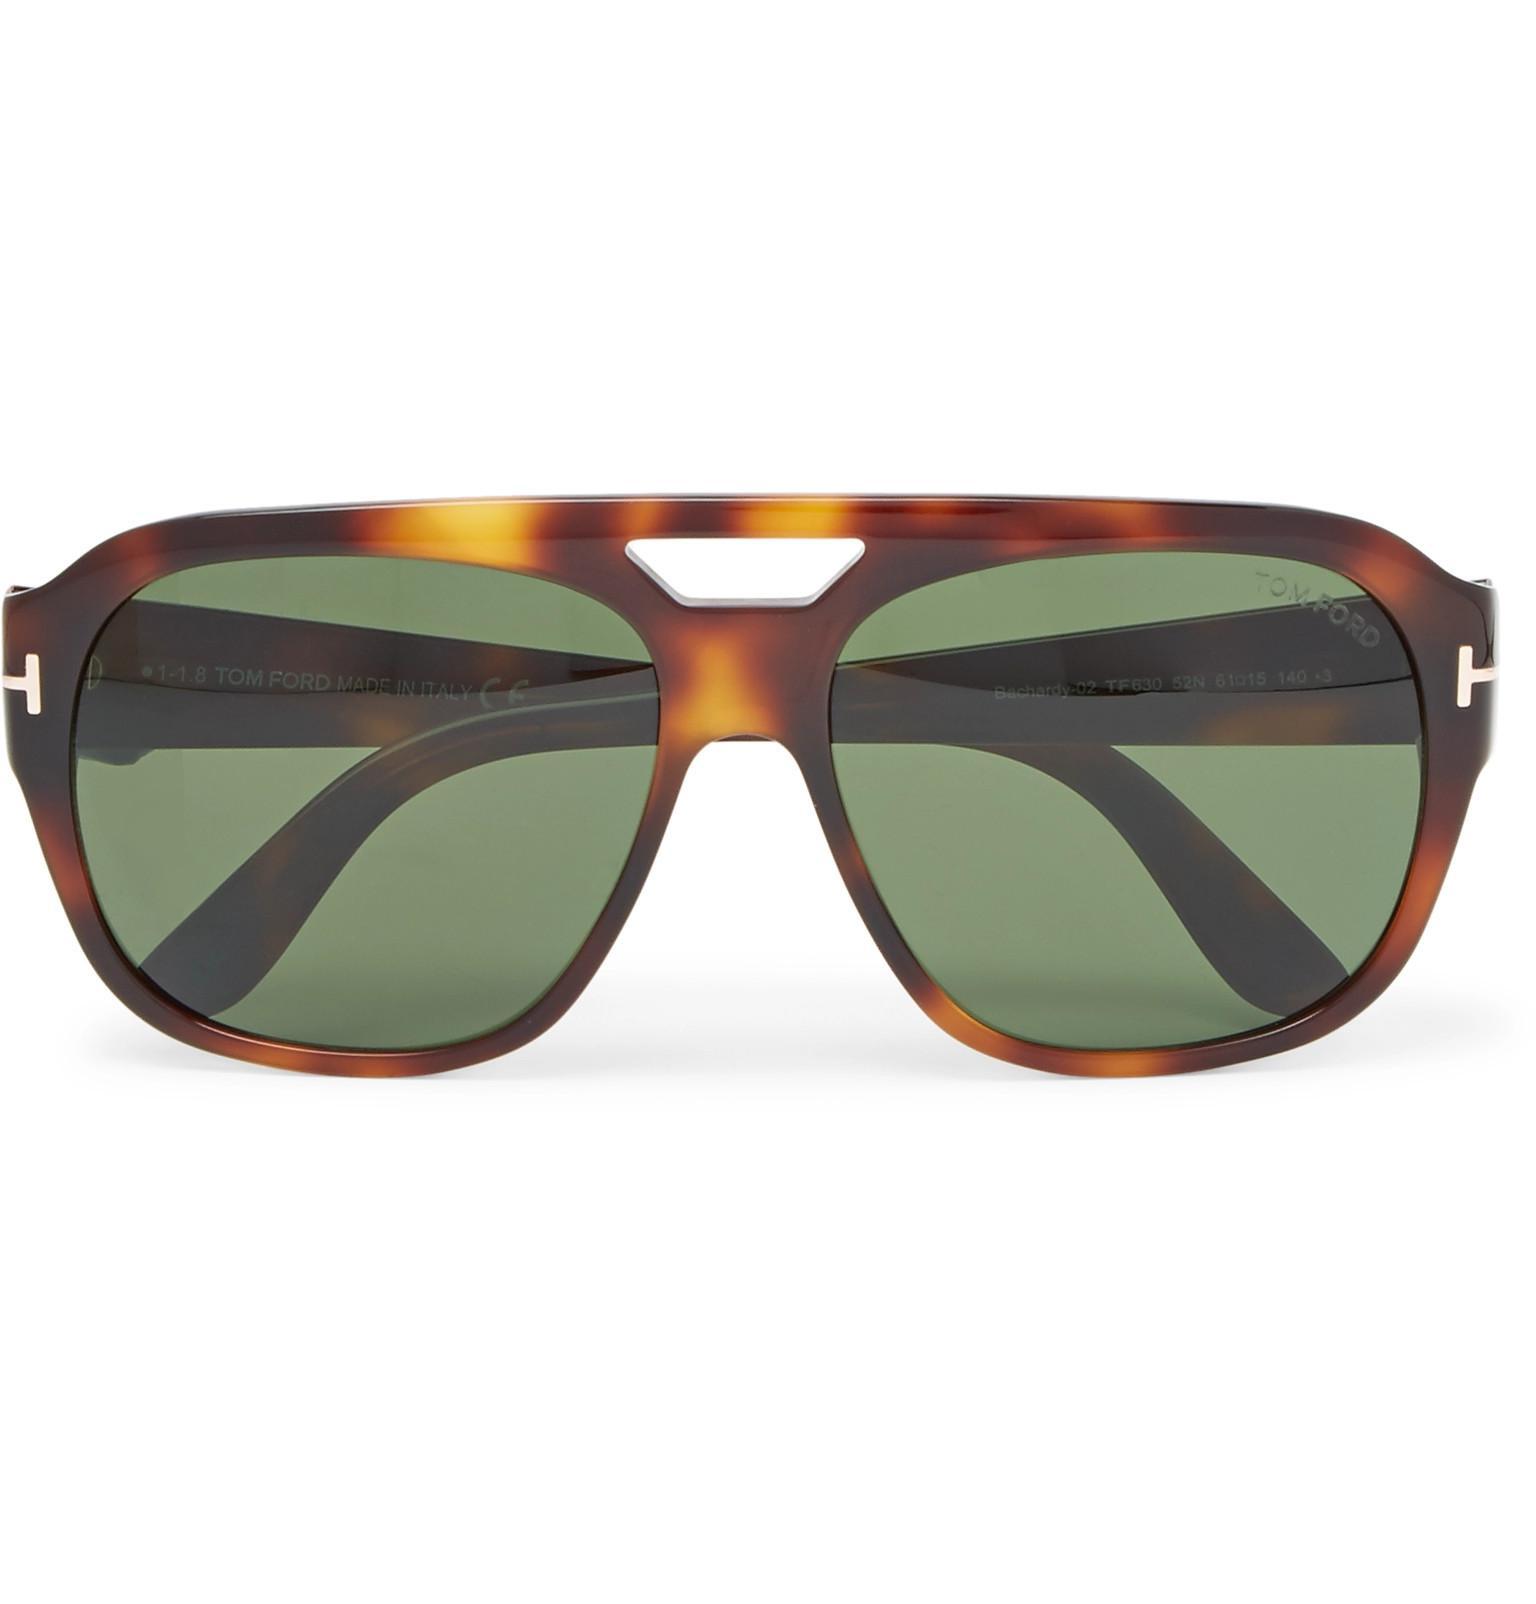 c96e6038d5ed7 Tom Ford Bachardy Aviator-style Tortoiseshell Acetate Sunglasses in ...